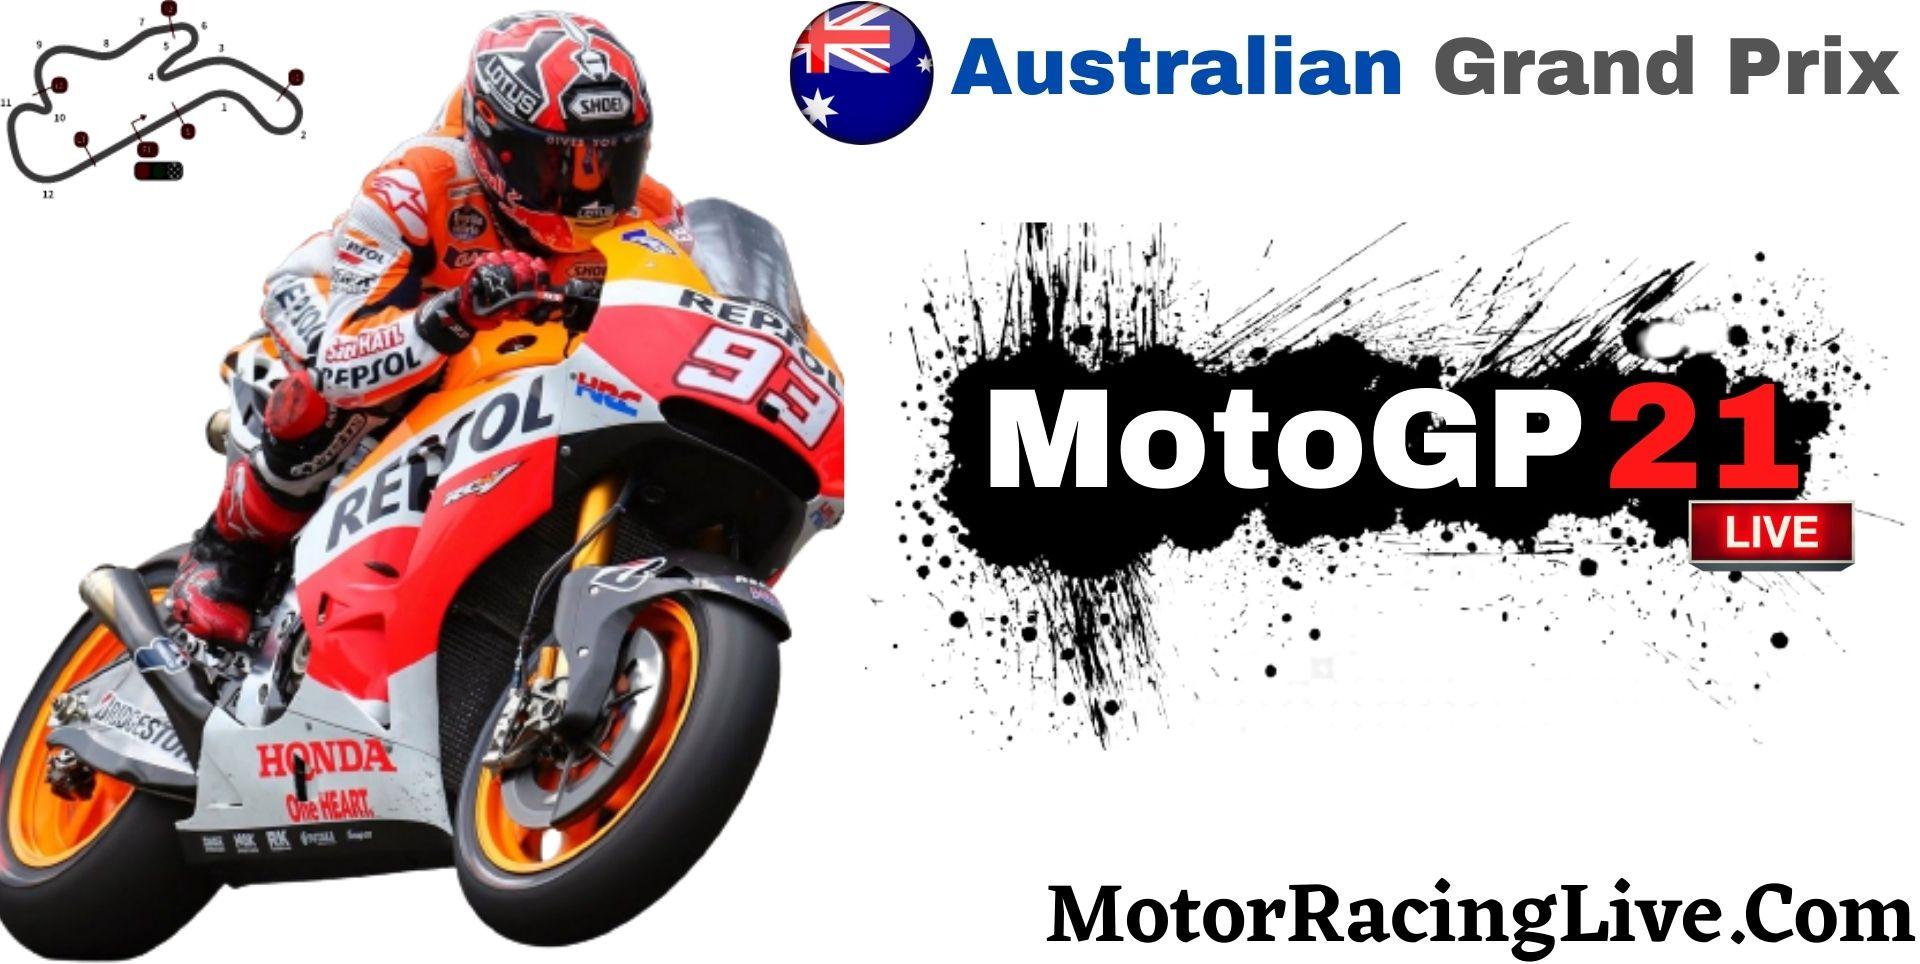 Australian Grand Prix MotoGP 2021 Live Stream | Full Race Replay